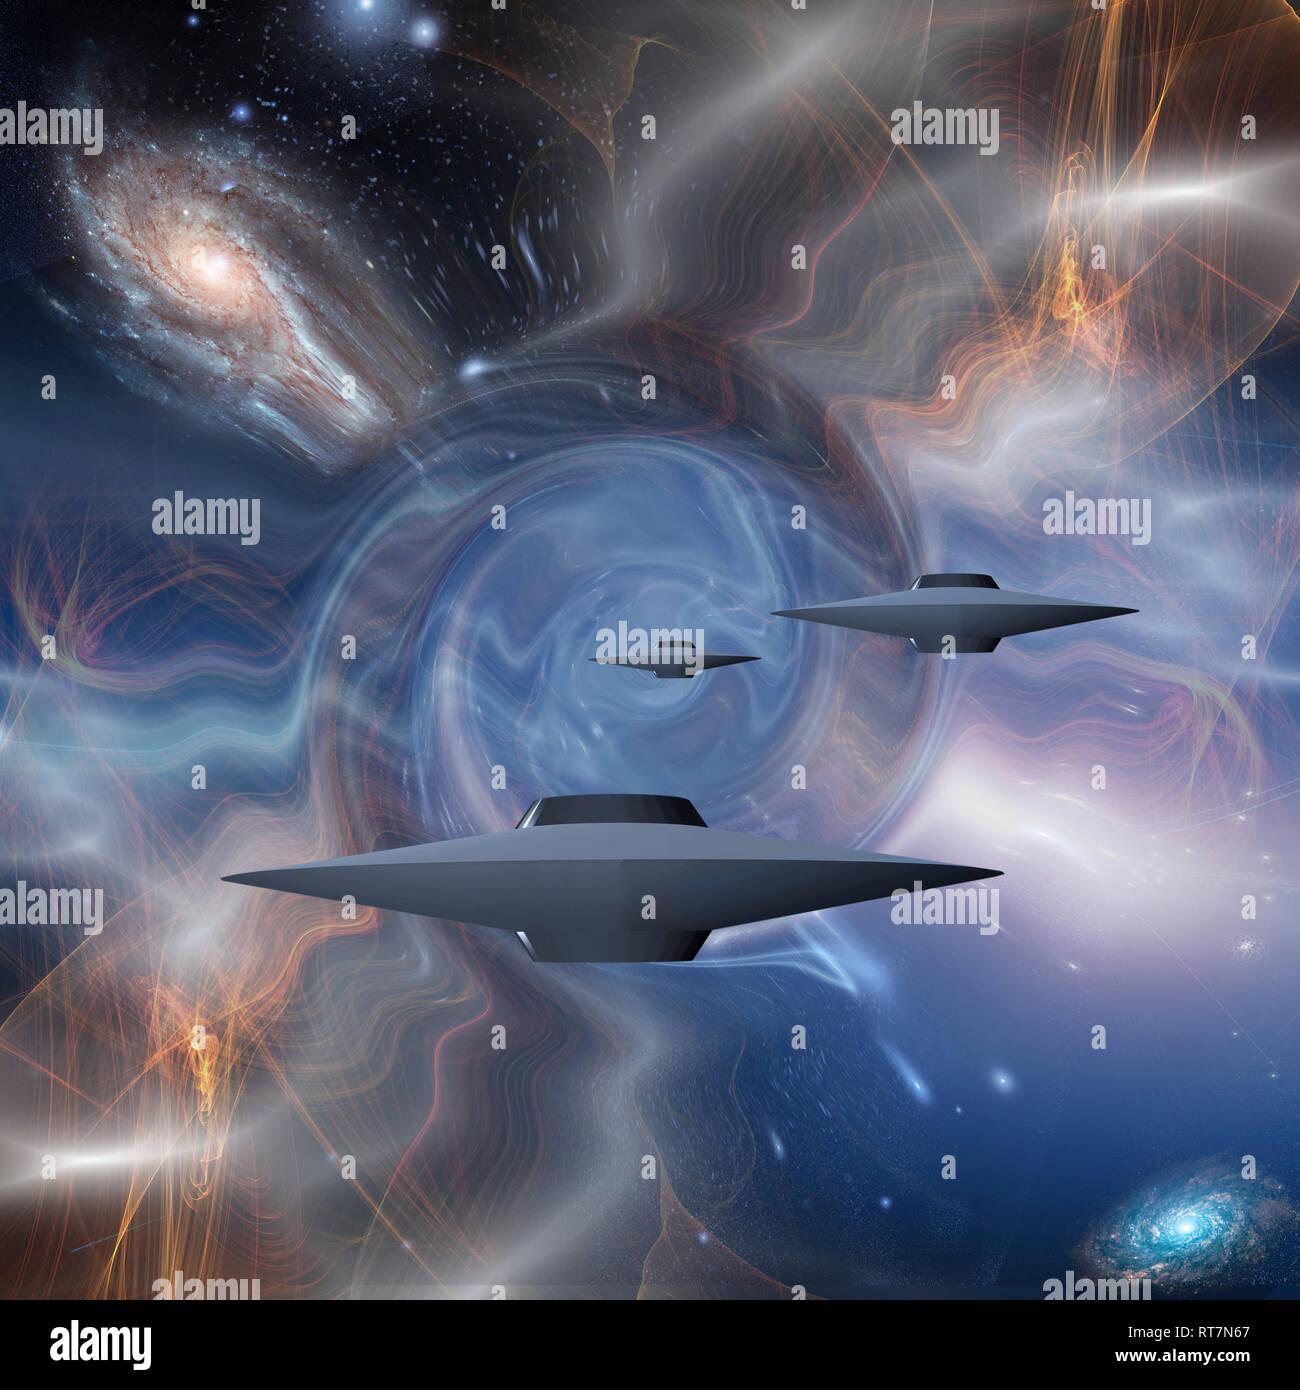 Surreal digital art. Flying saucers in warped space. 3D rendering. - Stock Image